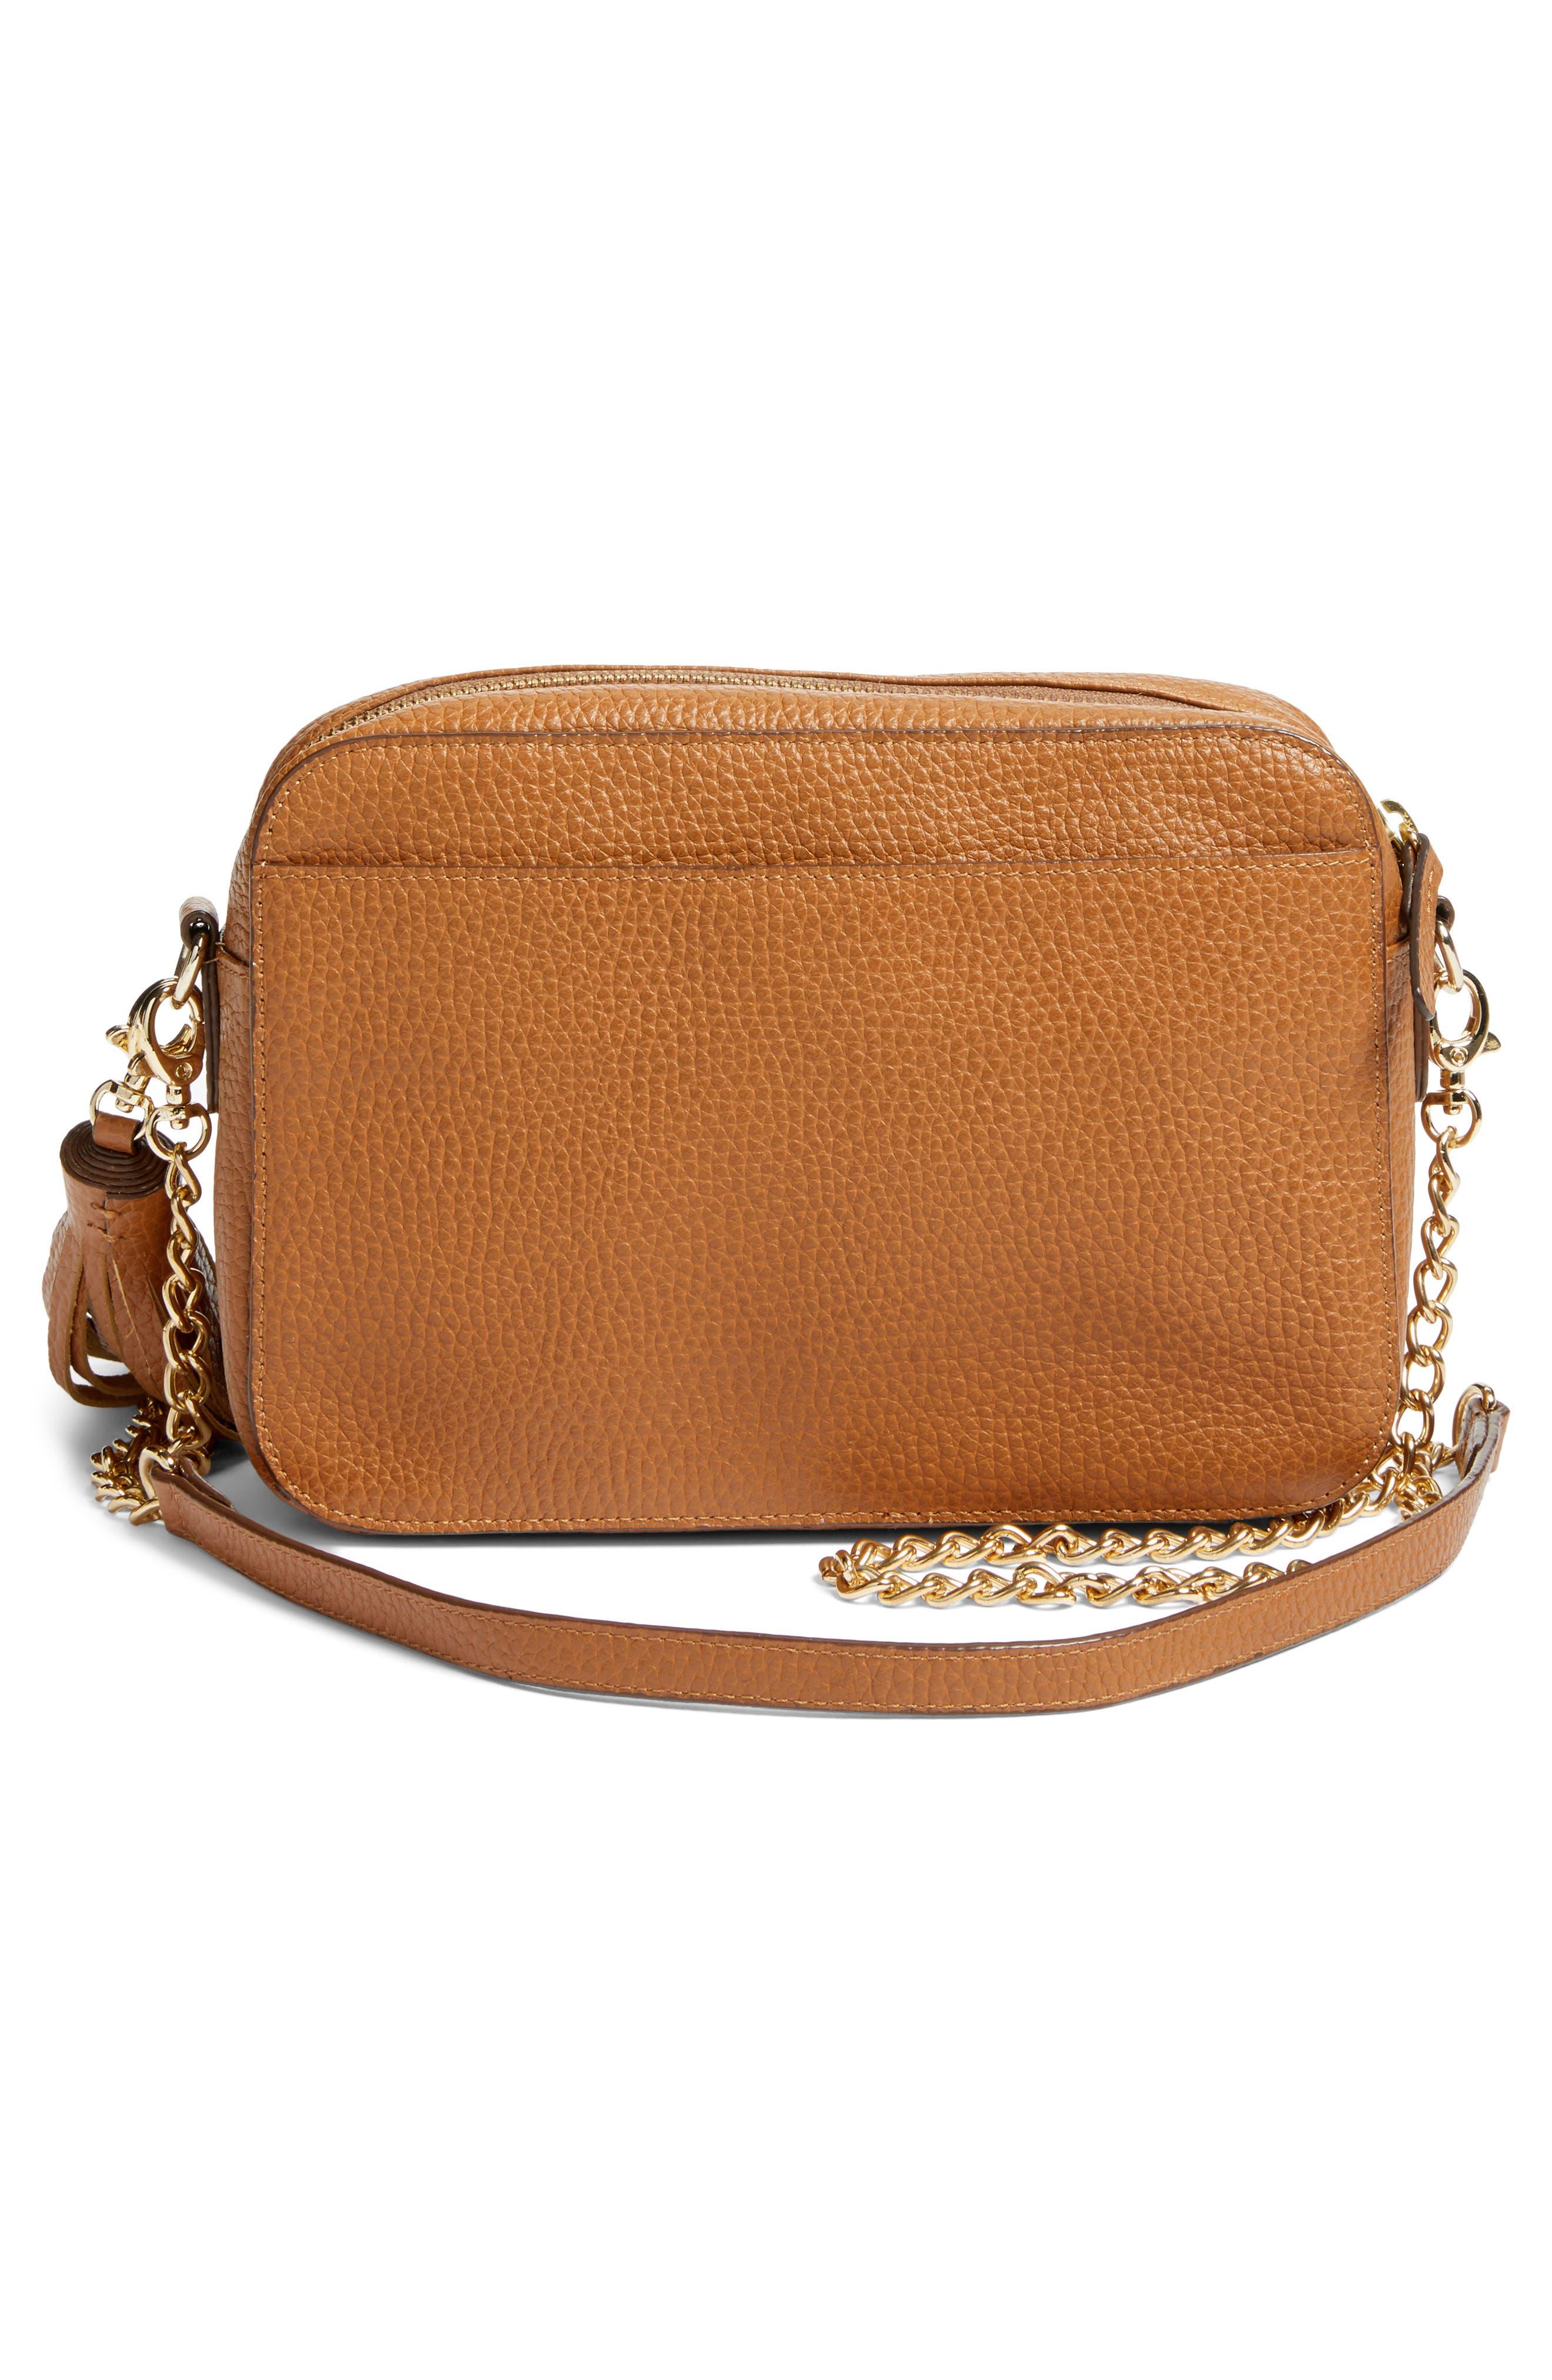 Ella Tassel Leather Crossbody Bag,                             Alternate thumbnail 3, color,                             Tan Spice